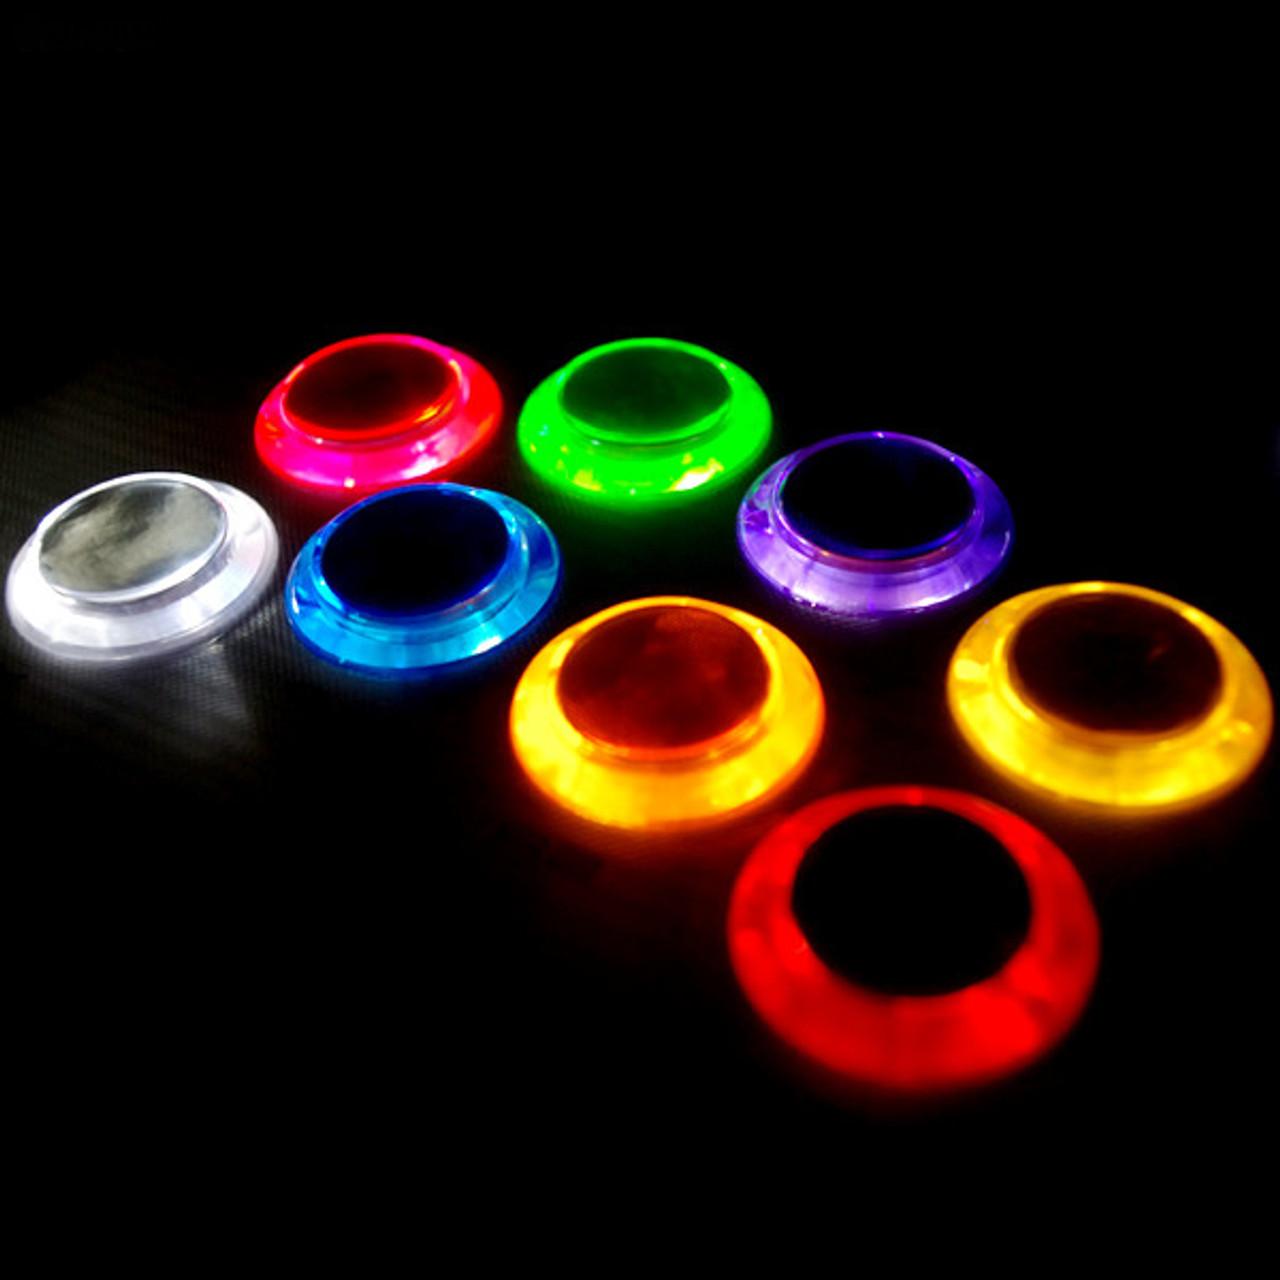 Seimitsu Psl 30n 5w2 5v Illuminated Screw In Arcade Button